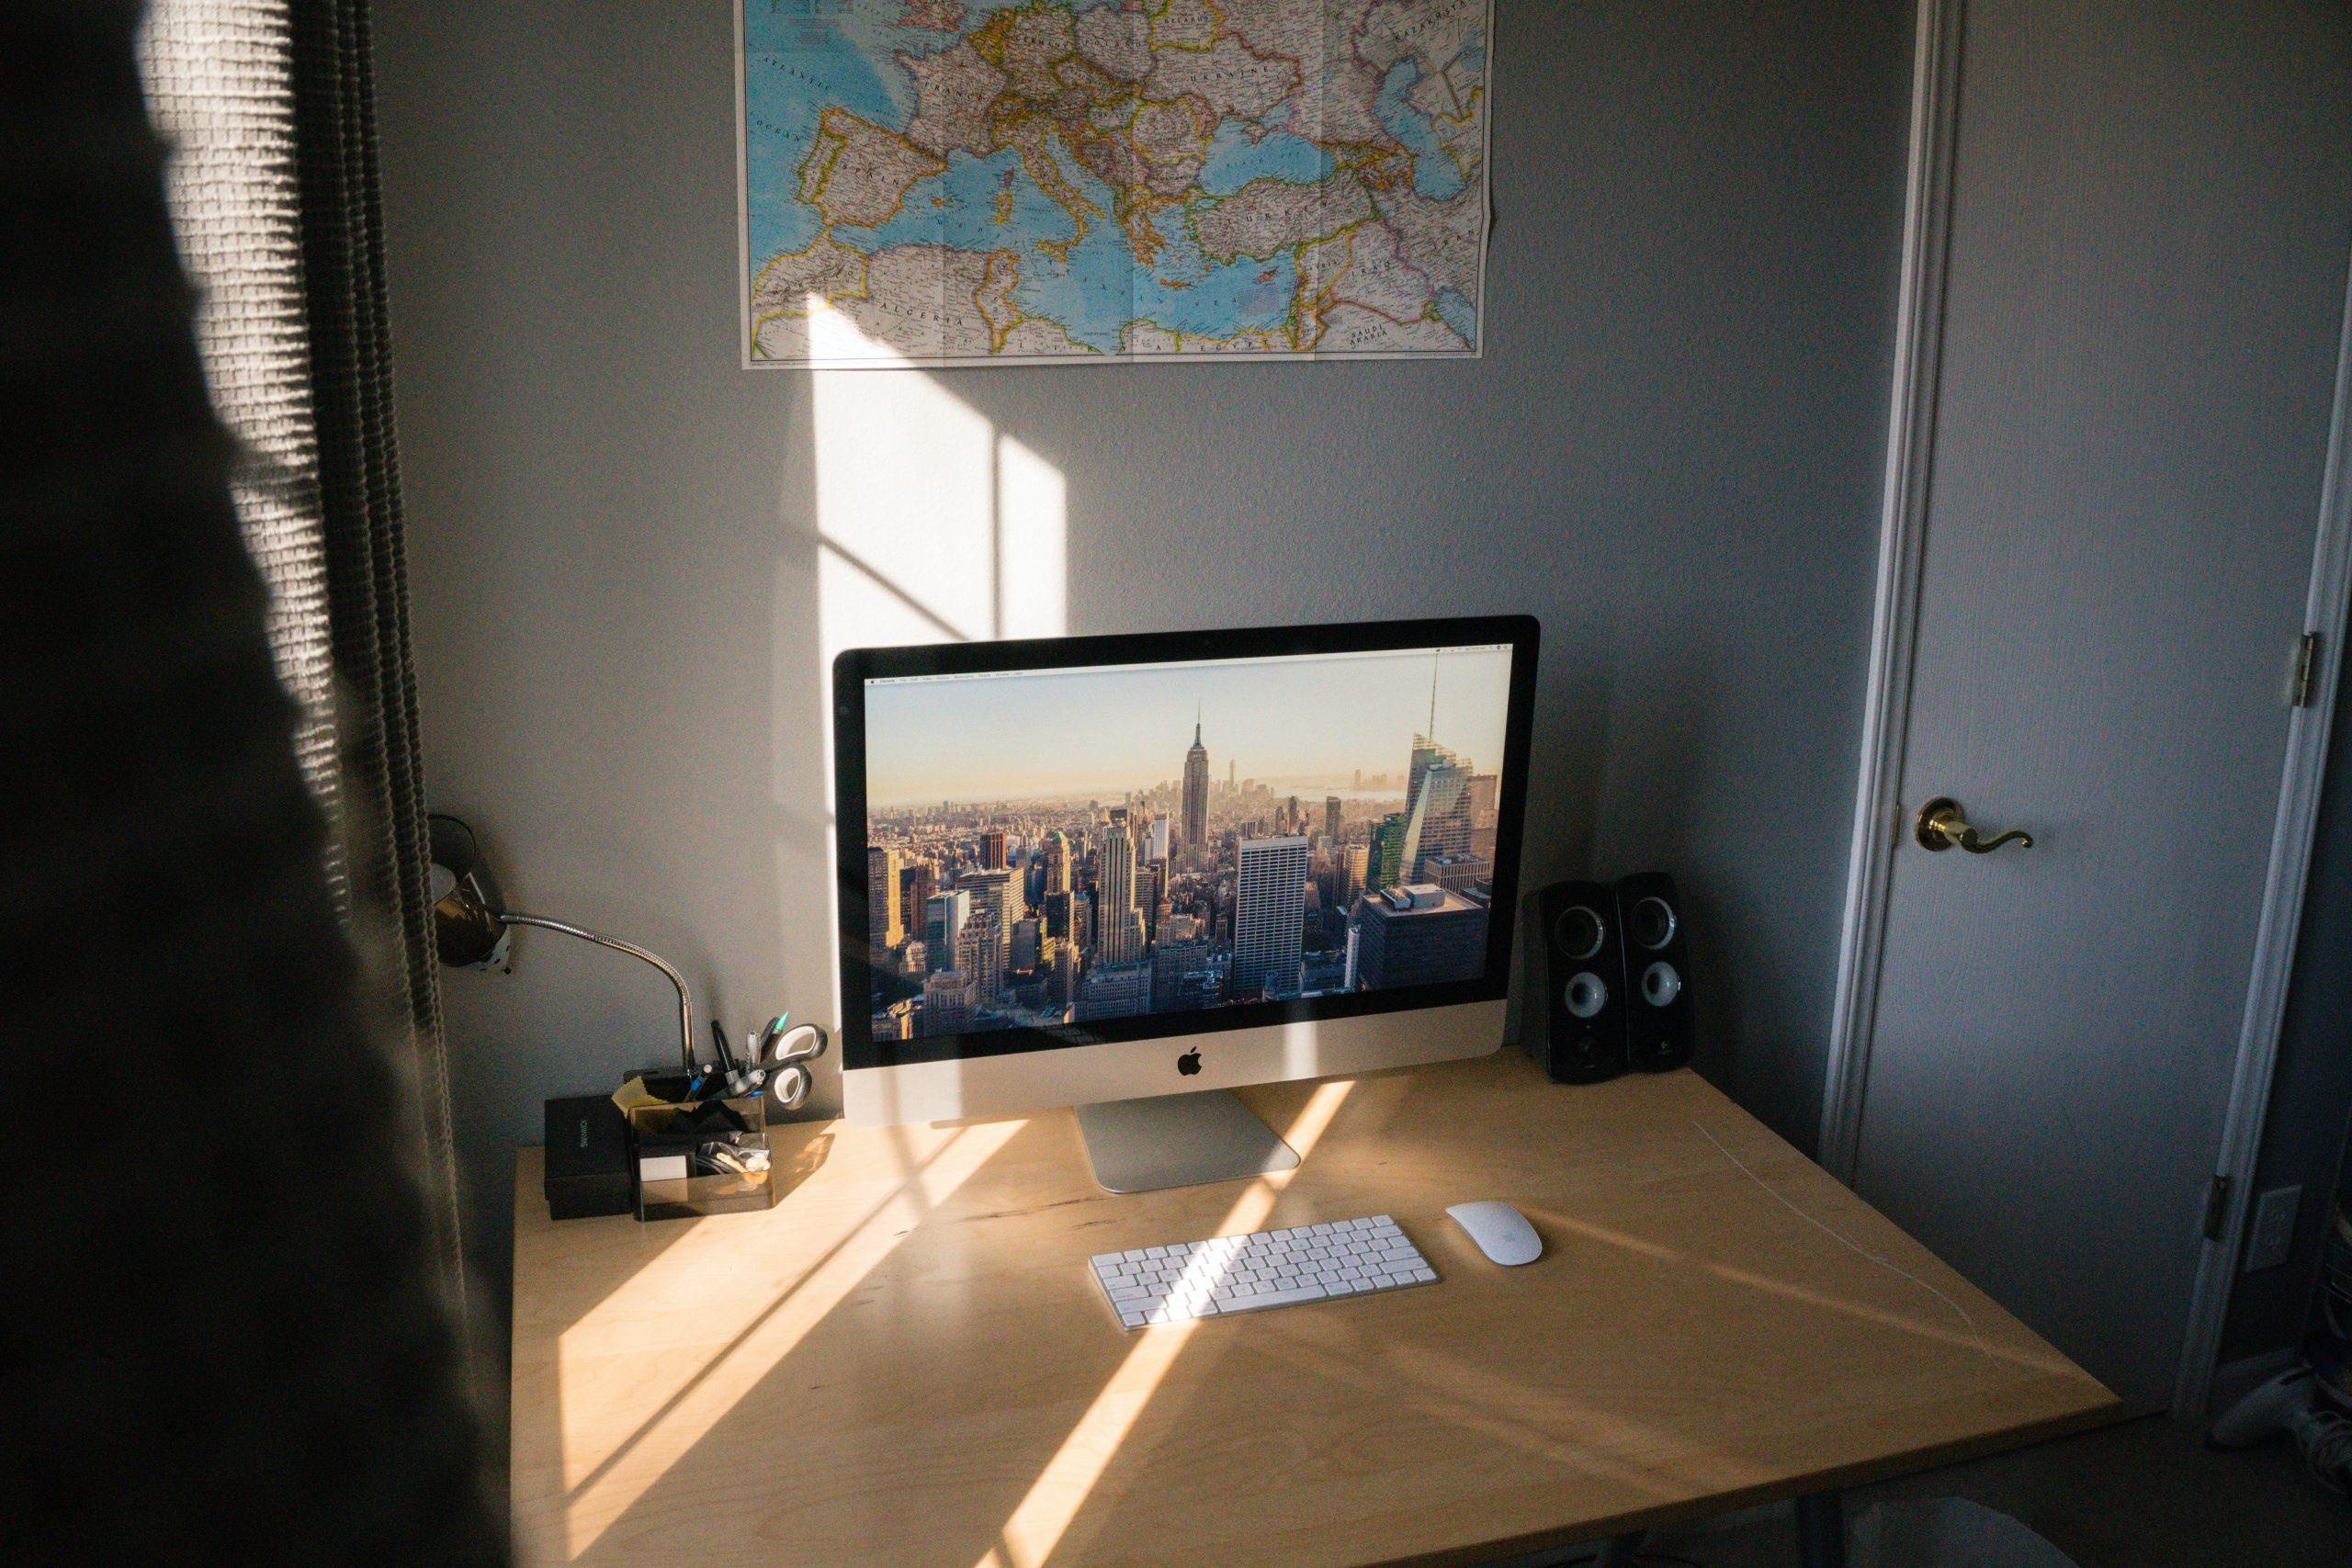 imac-27-inch-laptopvang.com